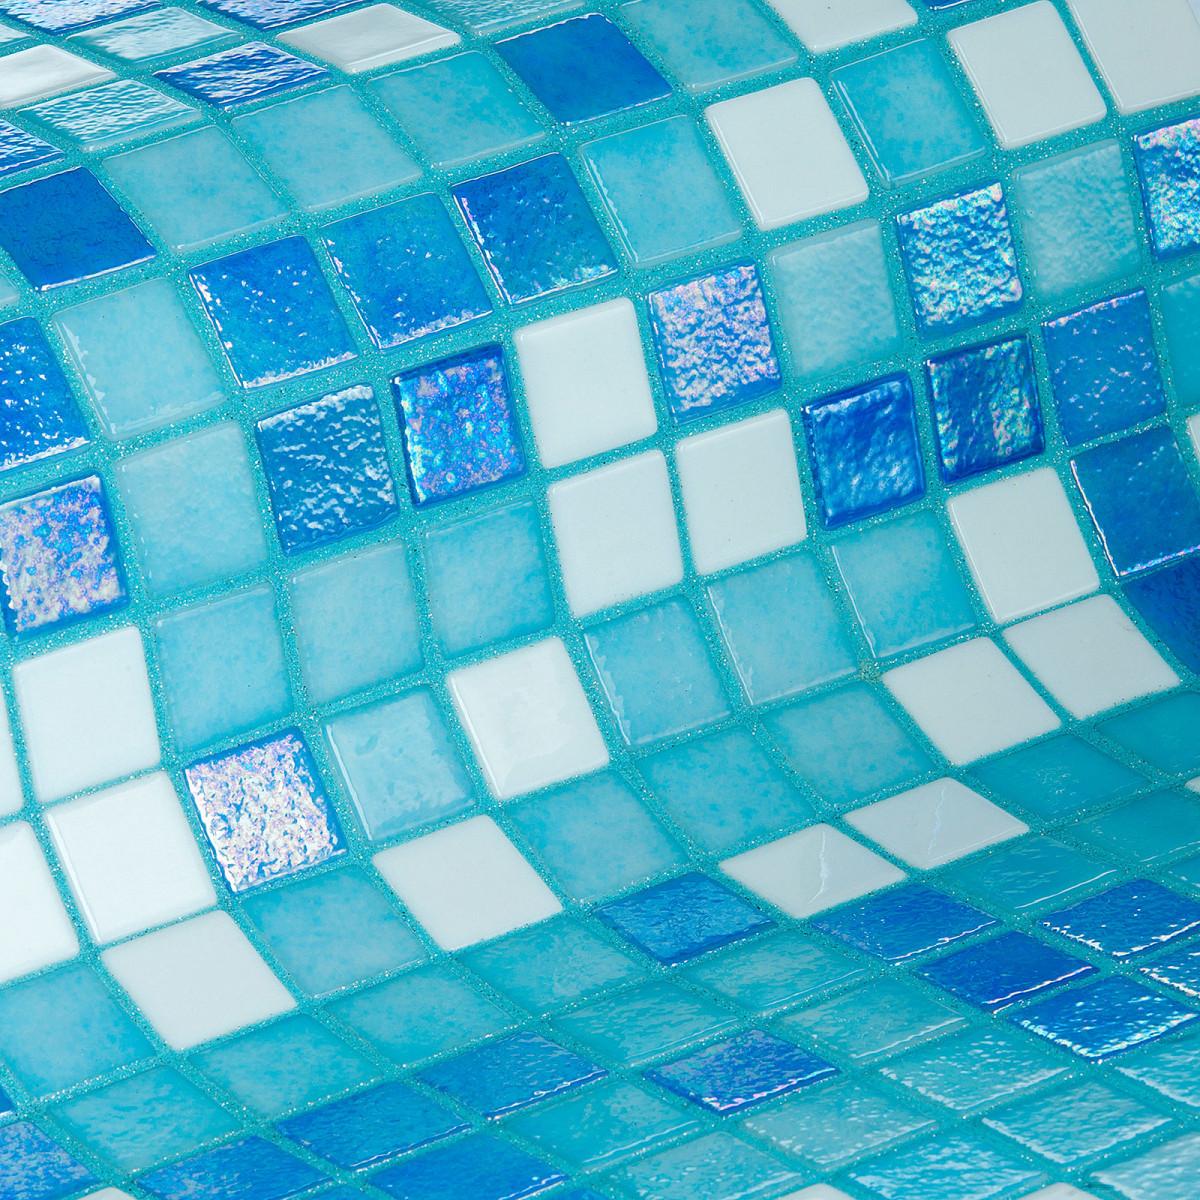 плитка голубая картинки